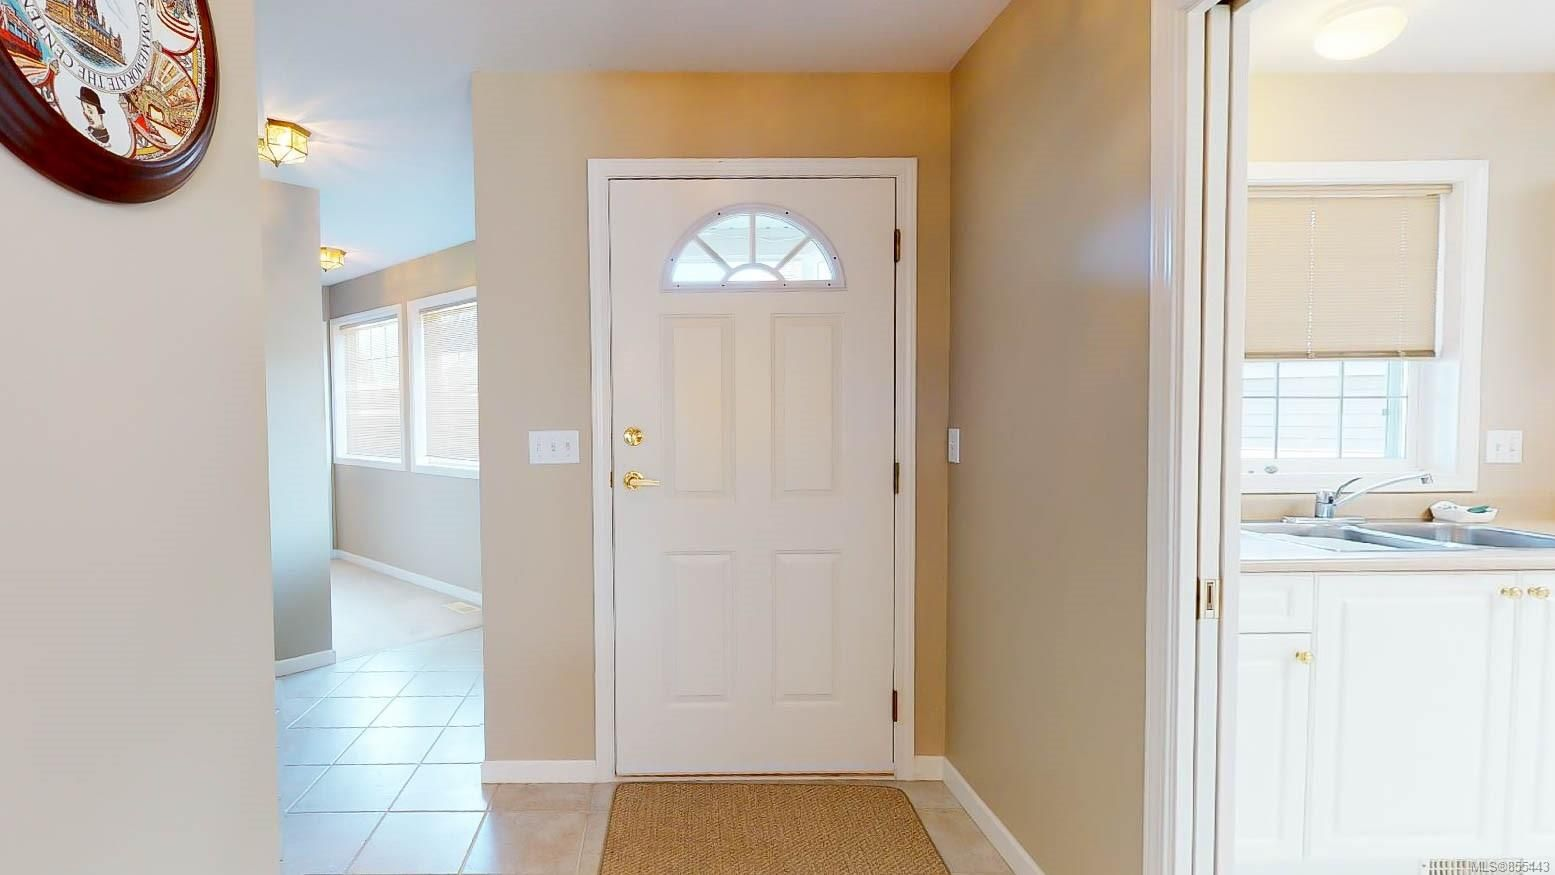 Photo 12: Photos: 1294 Leeward Way in : PQ Qualicum Beach House for sale (Parksville/Qualicum)  : MLS®# 855443